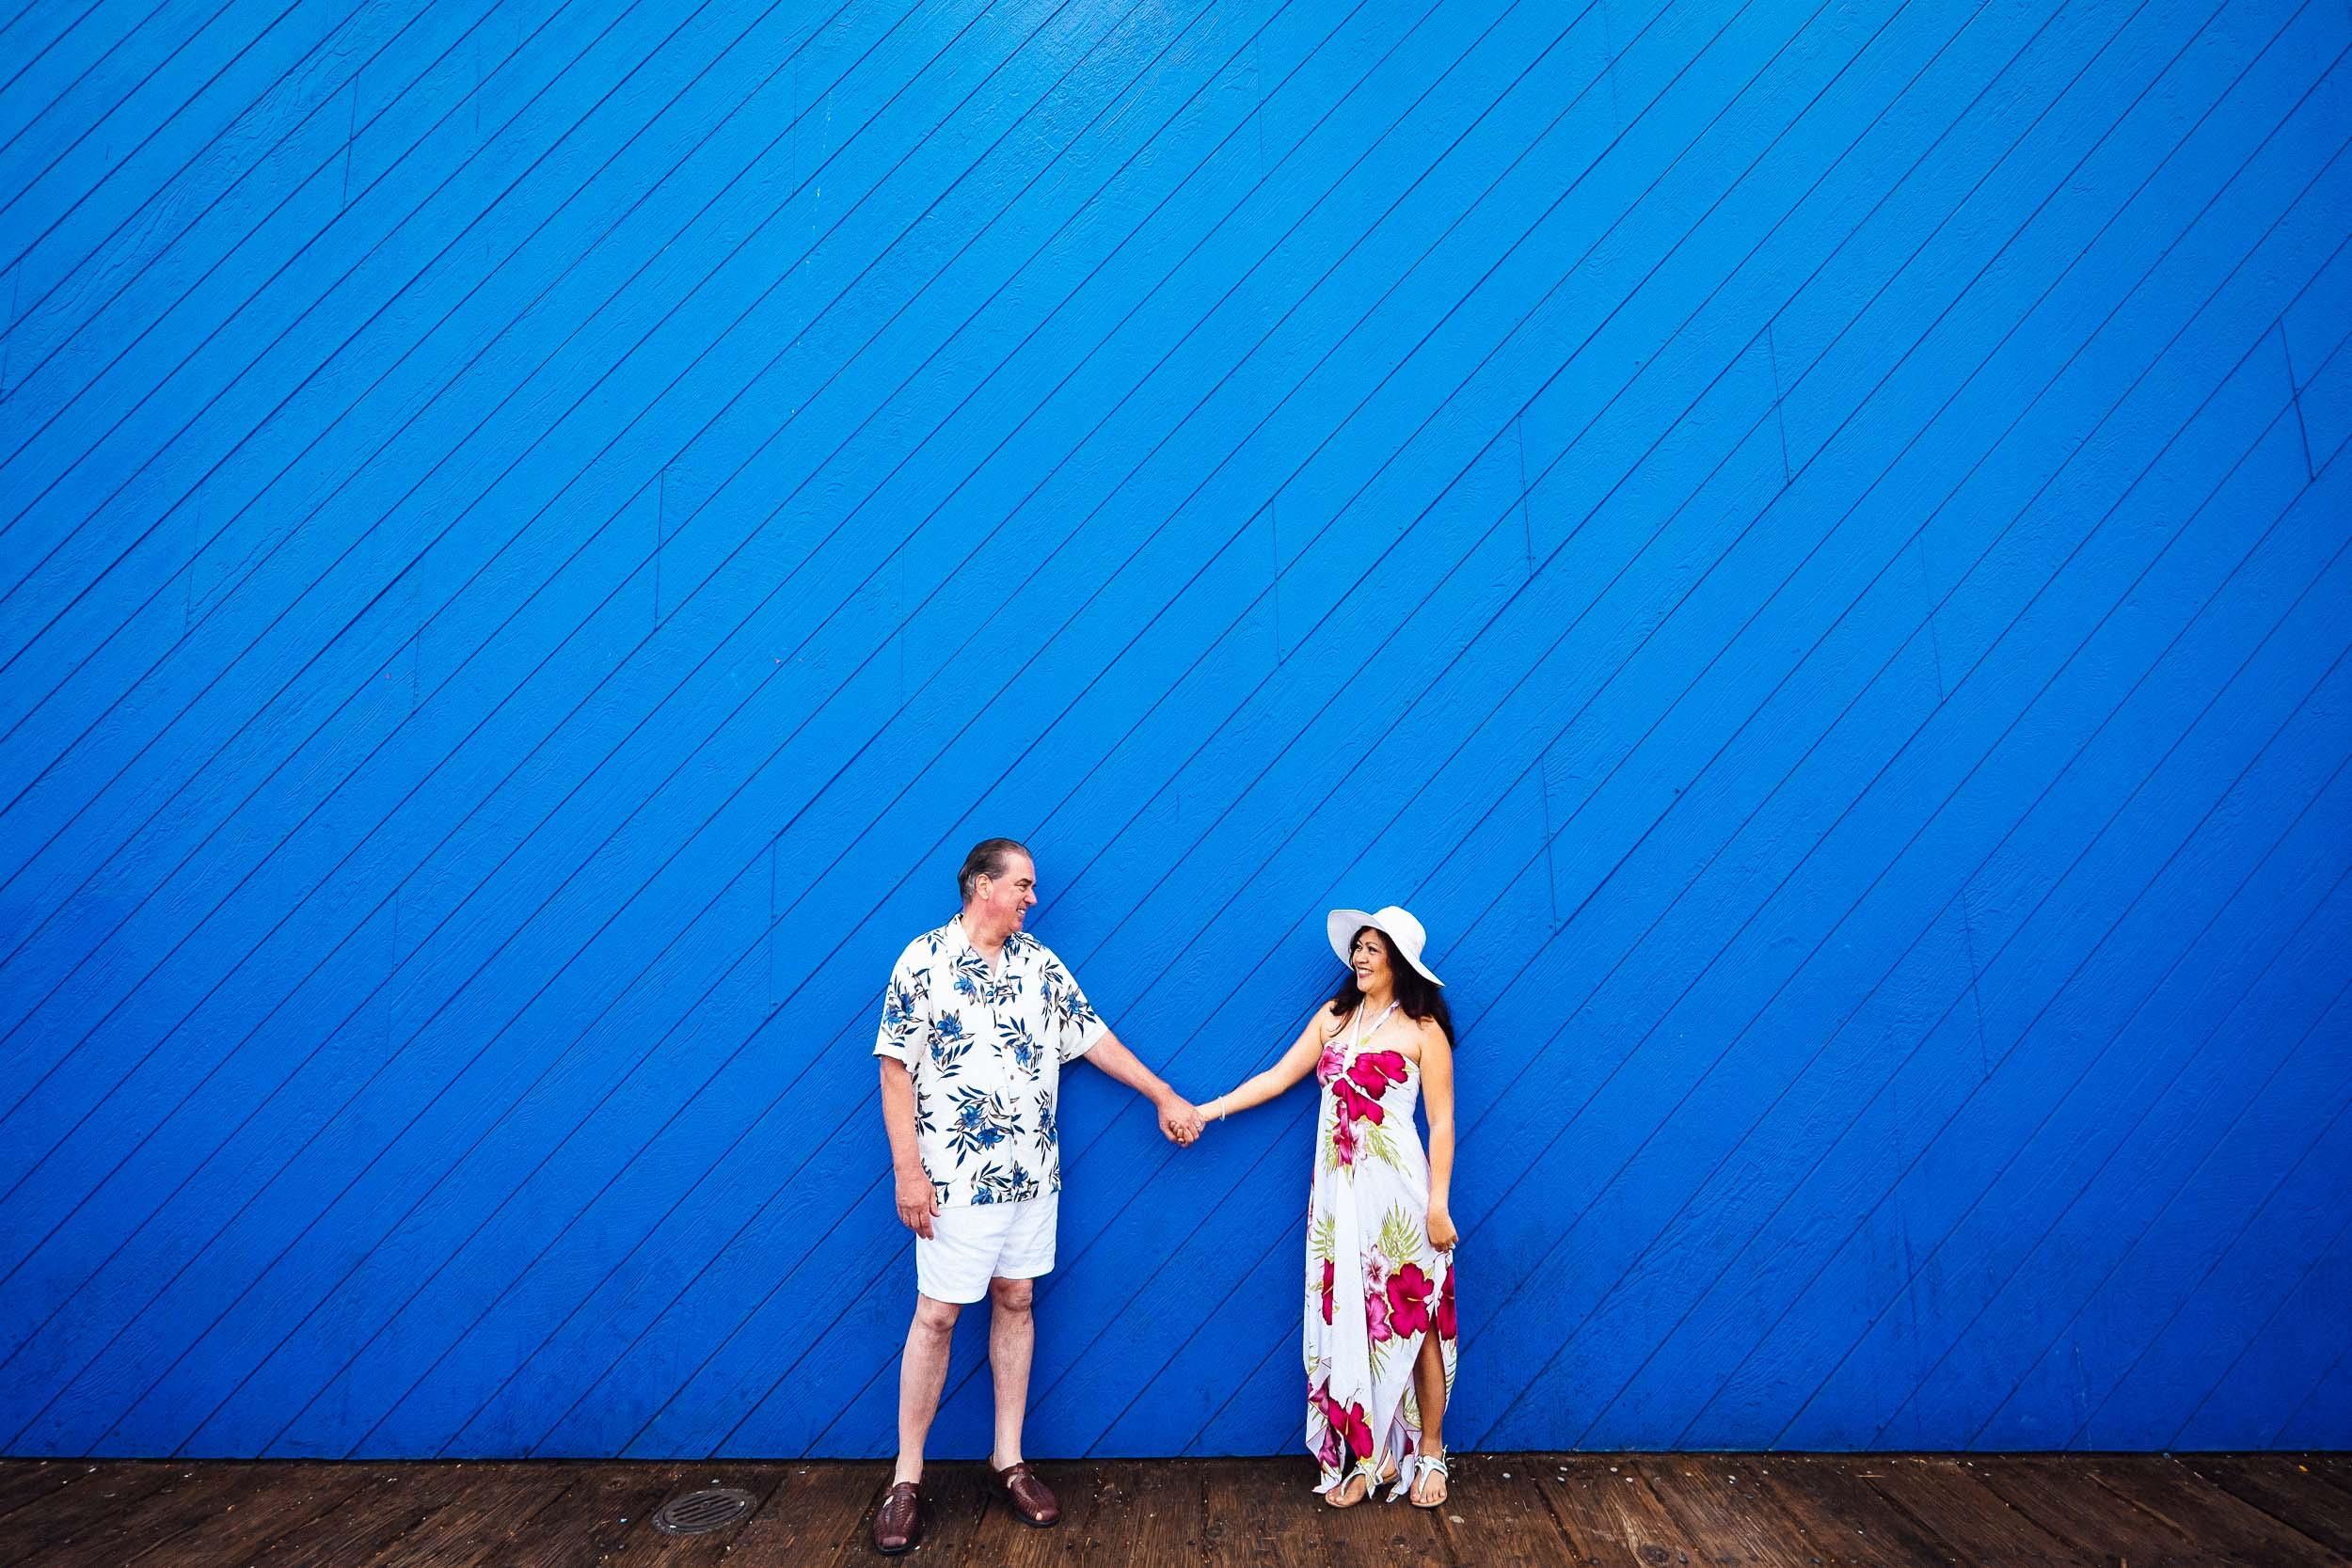 Bryan-Miraflor-Photography-Rose-Engagement-Photoshoot-20150613-0278.jpg